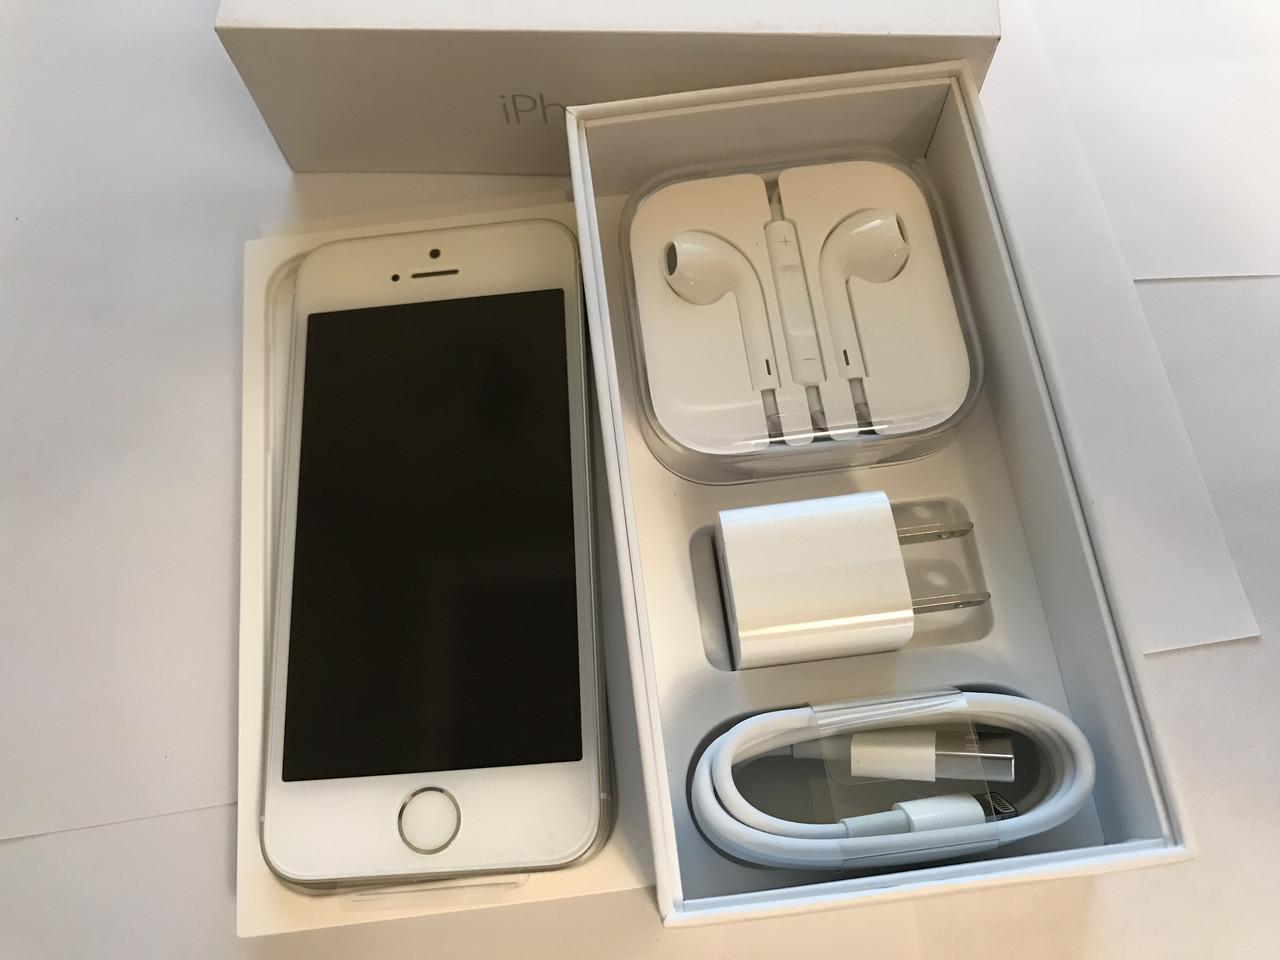 Новый Apple iPhone SE 64GB Silver АктивироваН! НЕ РЕФРЕШ! Оригинал!